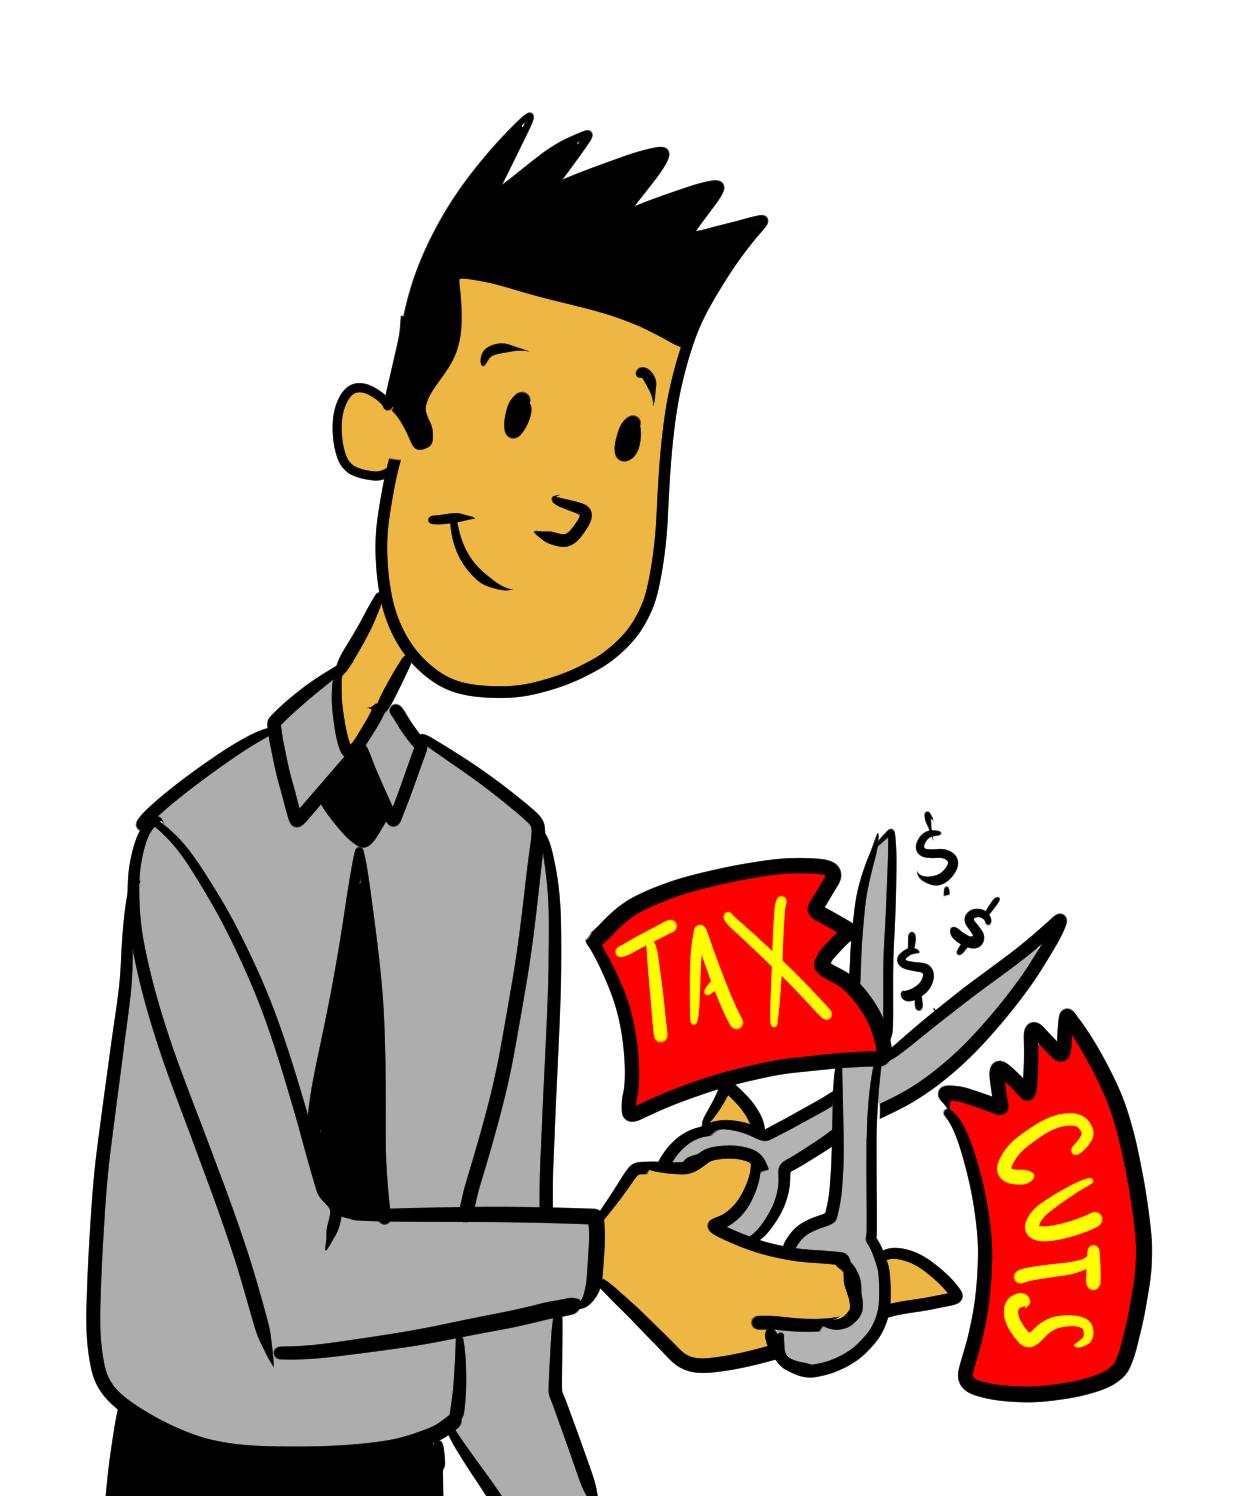 2018 Tax Cuts Section 179 Equipment